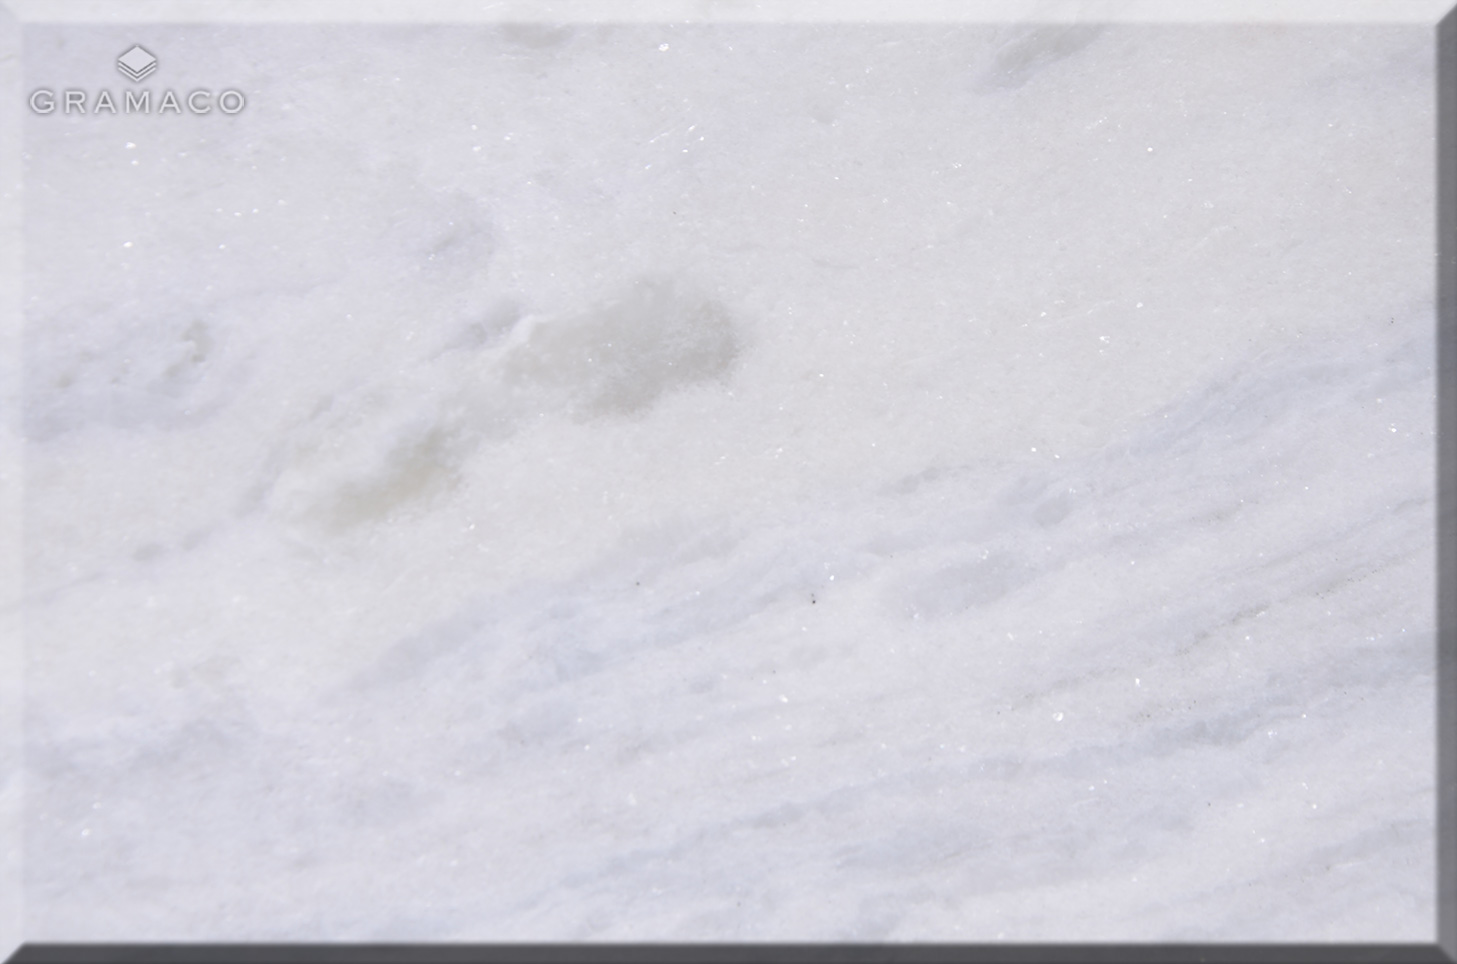 Caribbean Mist 2cm 037524 Gramaco